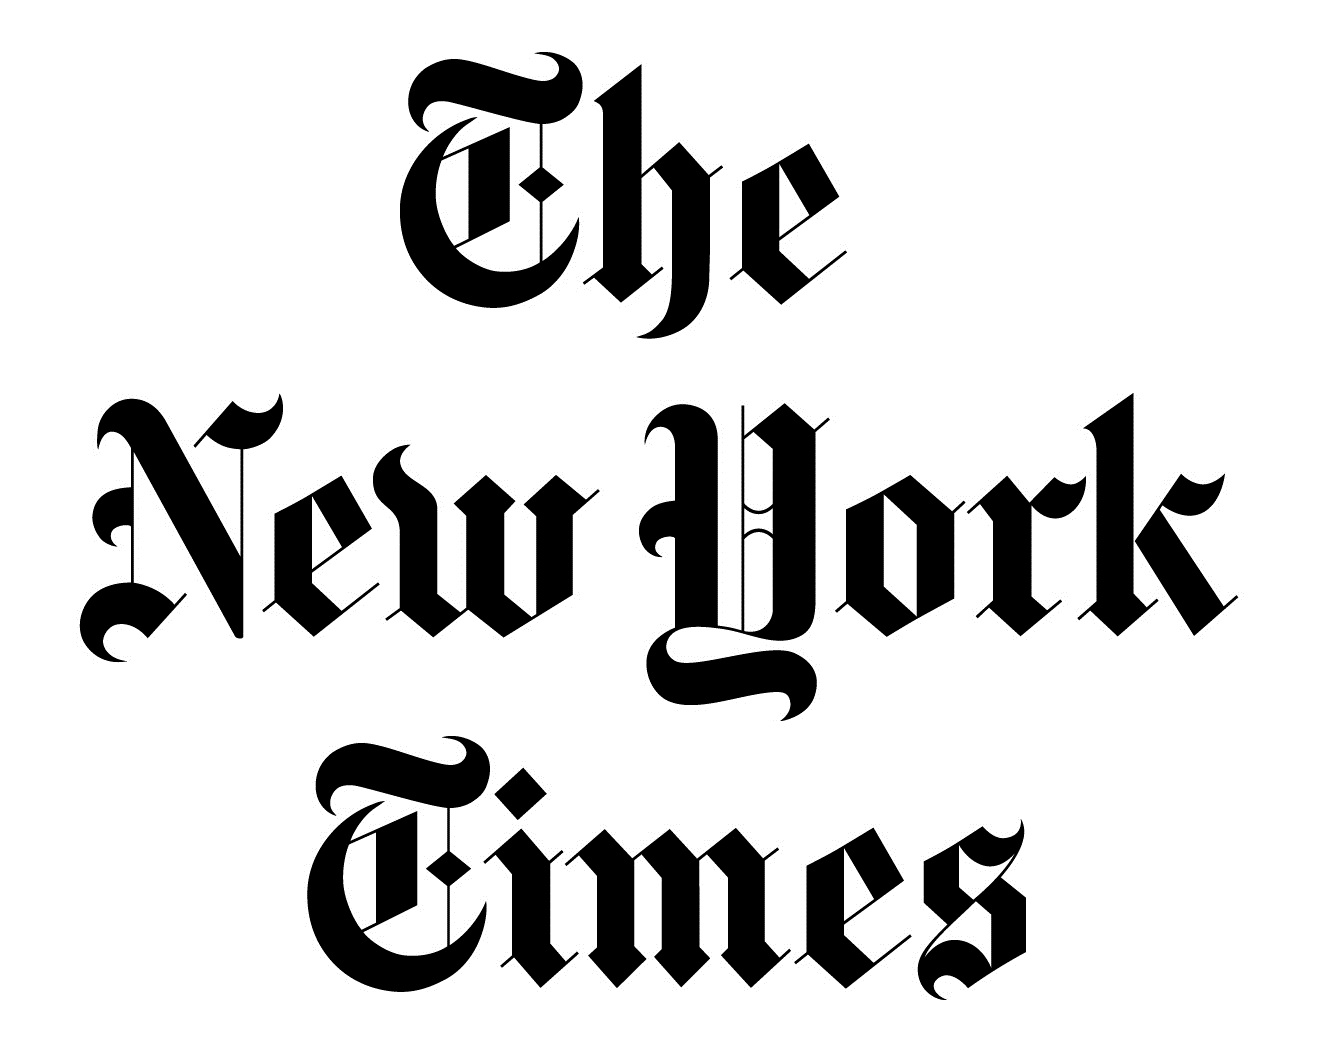 New York Times & Negranti Creamery